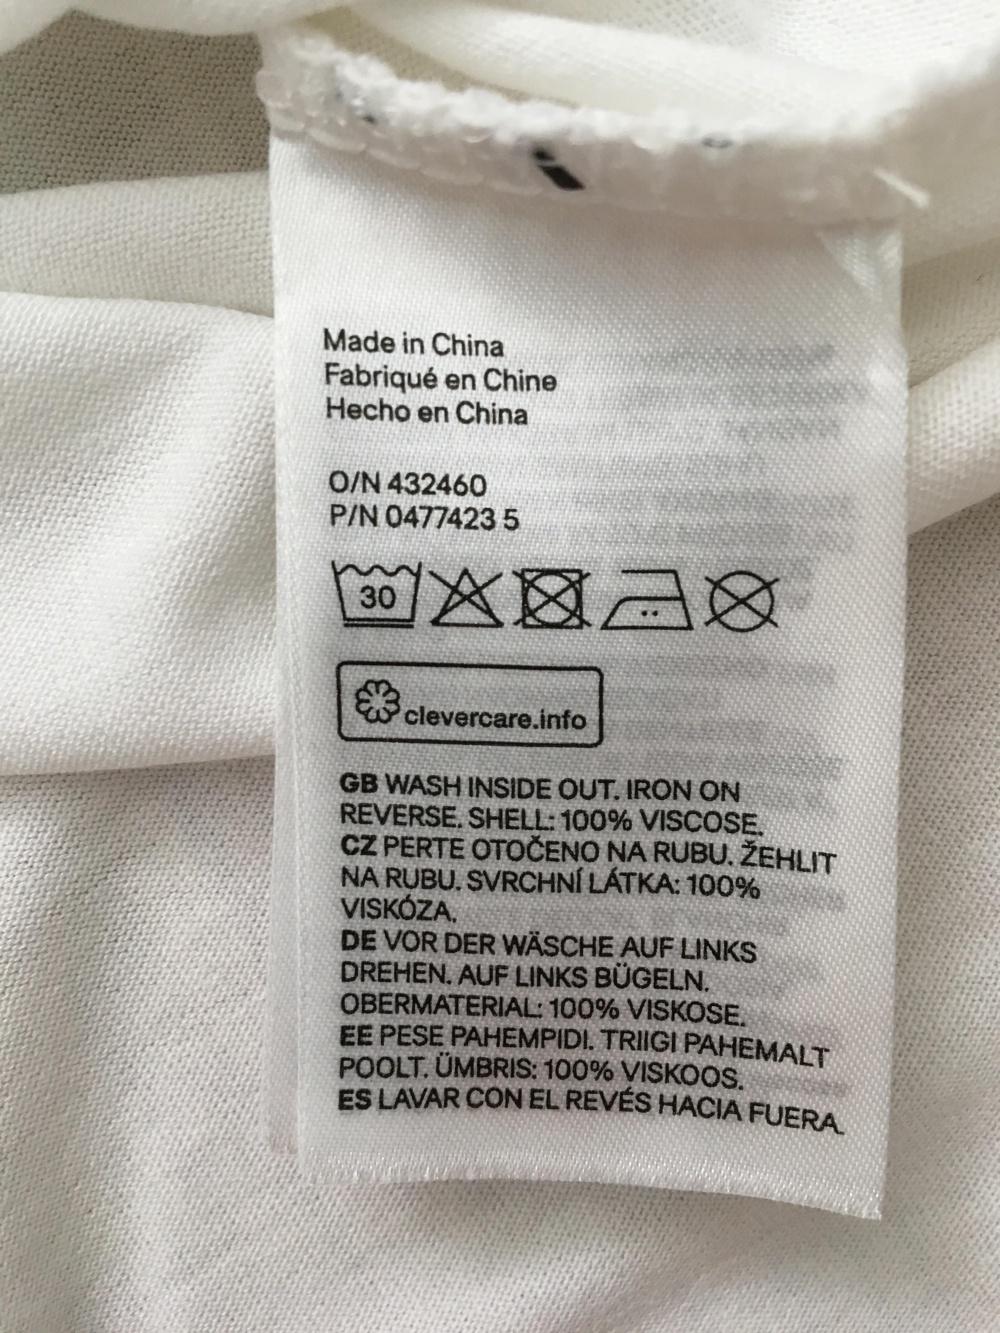 Комплект лонгслив H&M, размер S+ Брюки NLY trend, размер 42/44